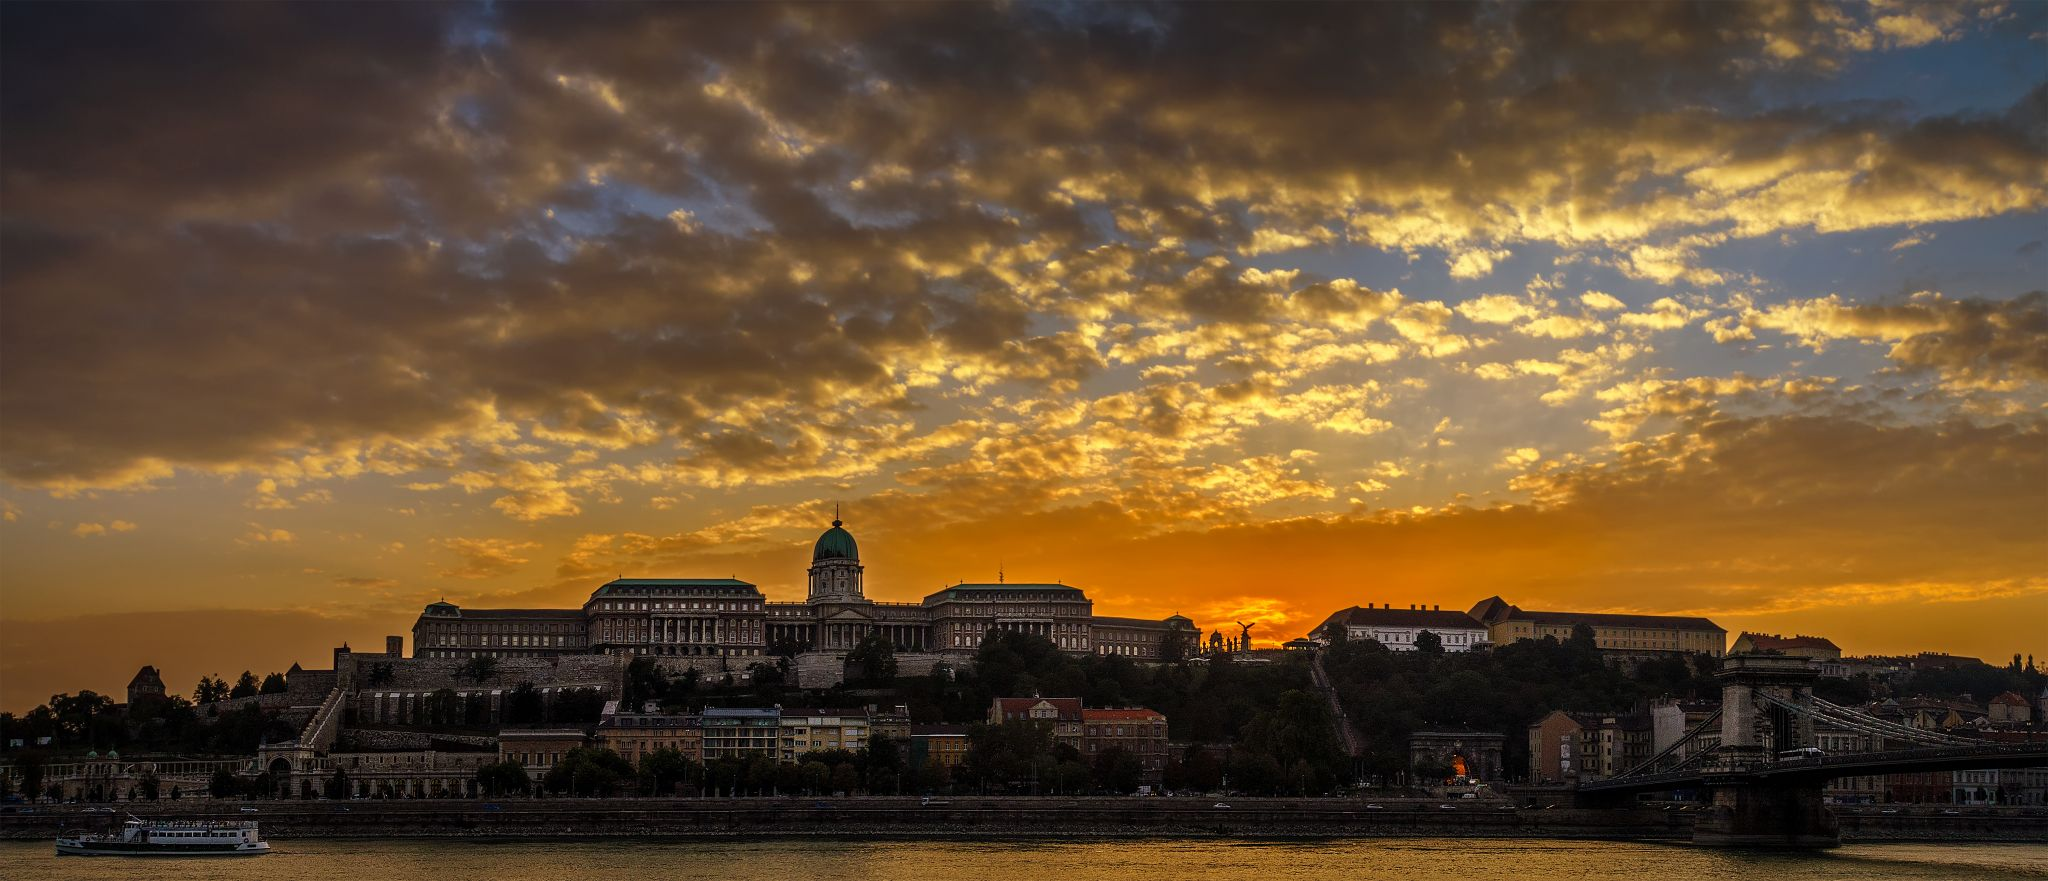 Buda Castle, Hungary